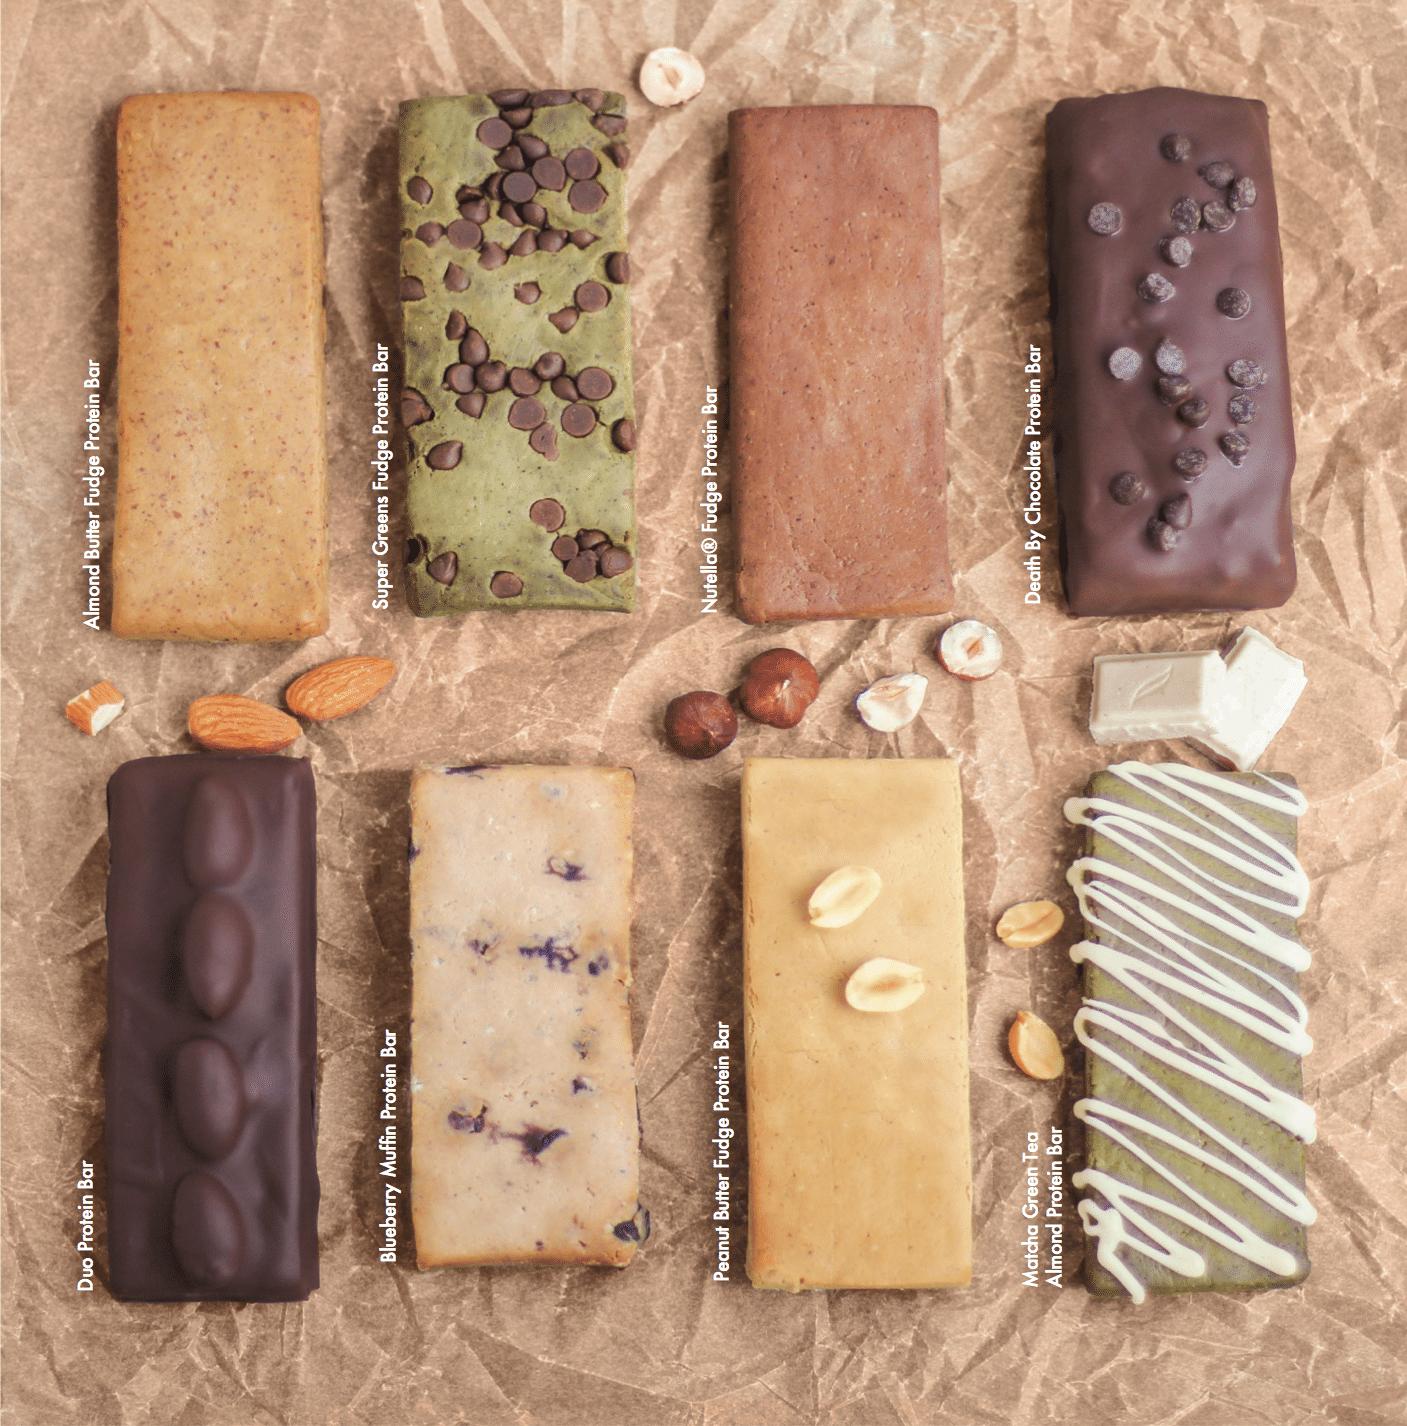 DIY Protein Bars Cookbook – Jessica Stier of Desserts with Benefits